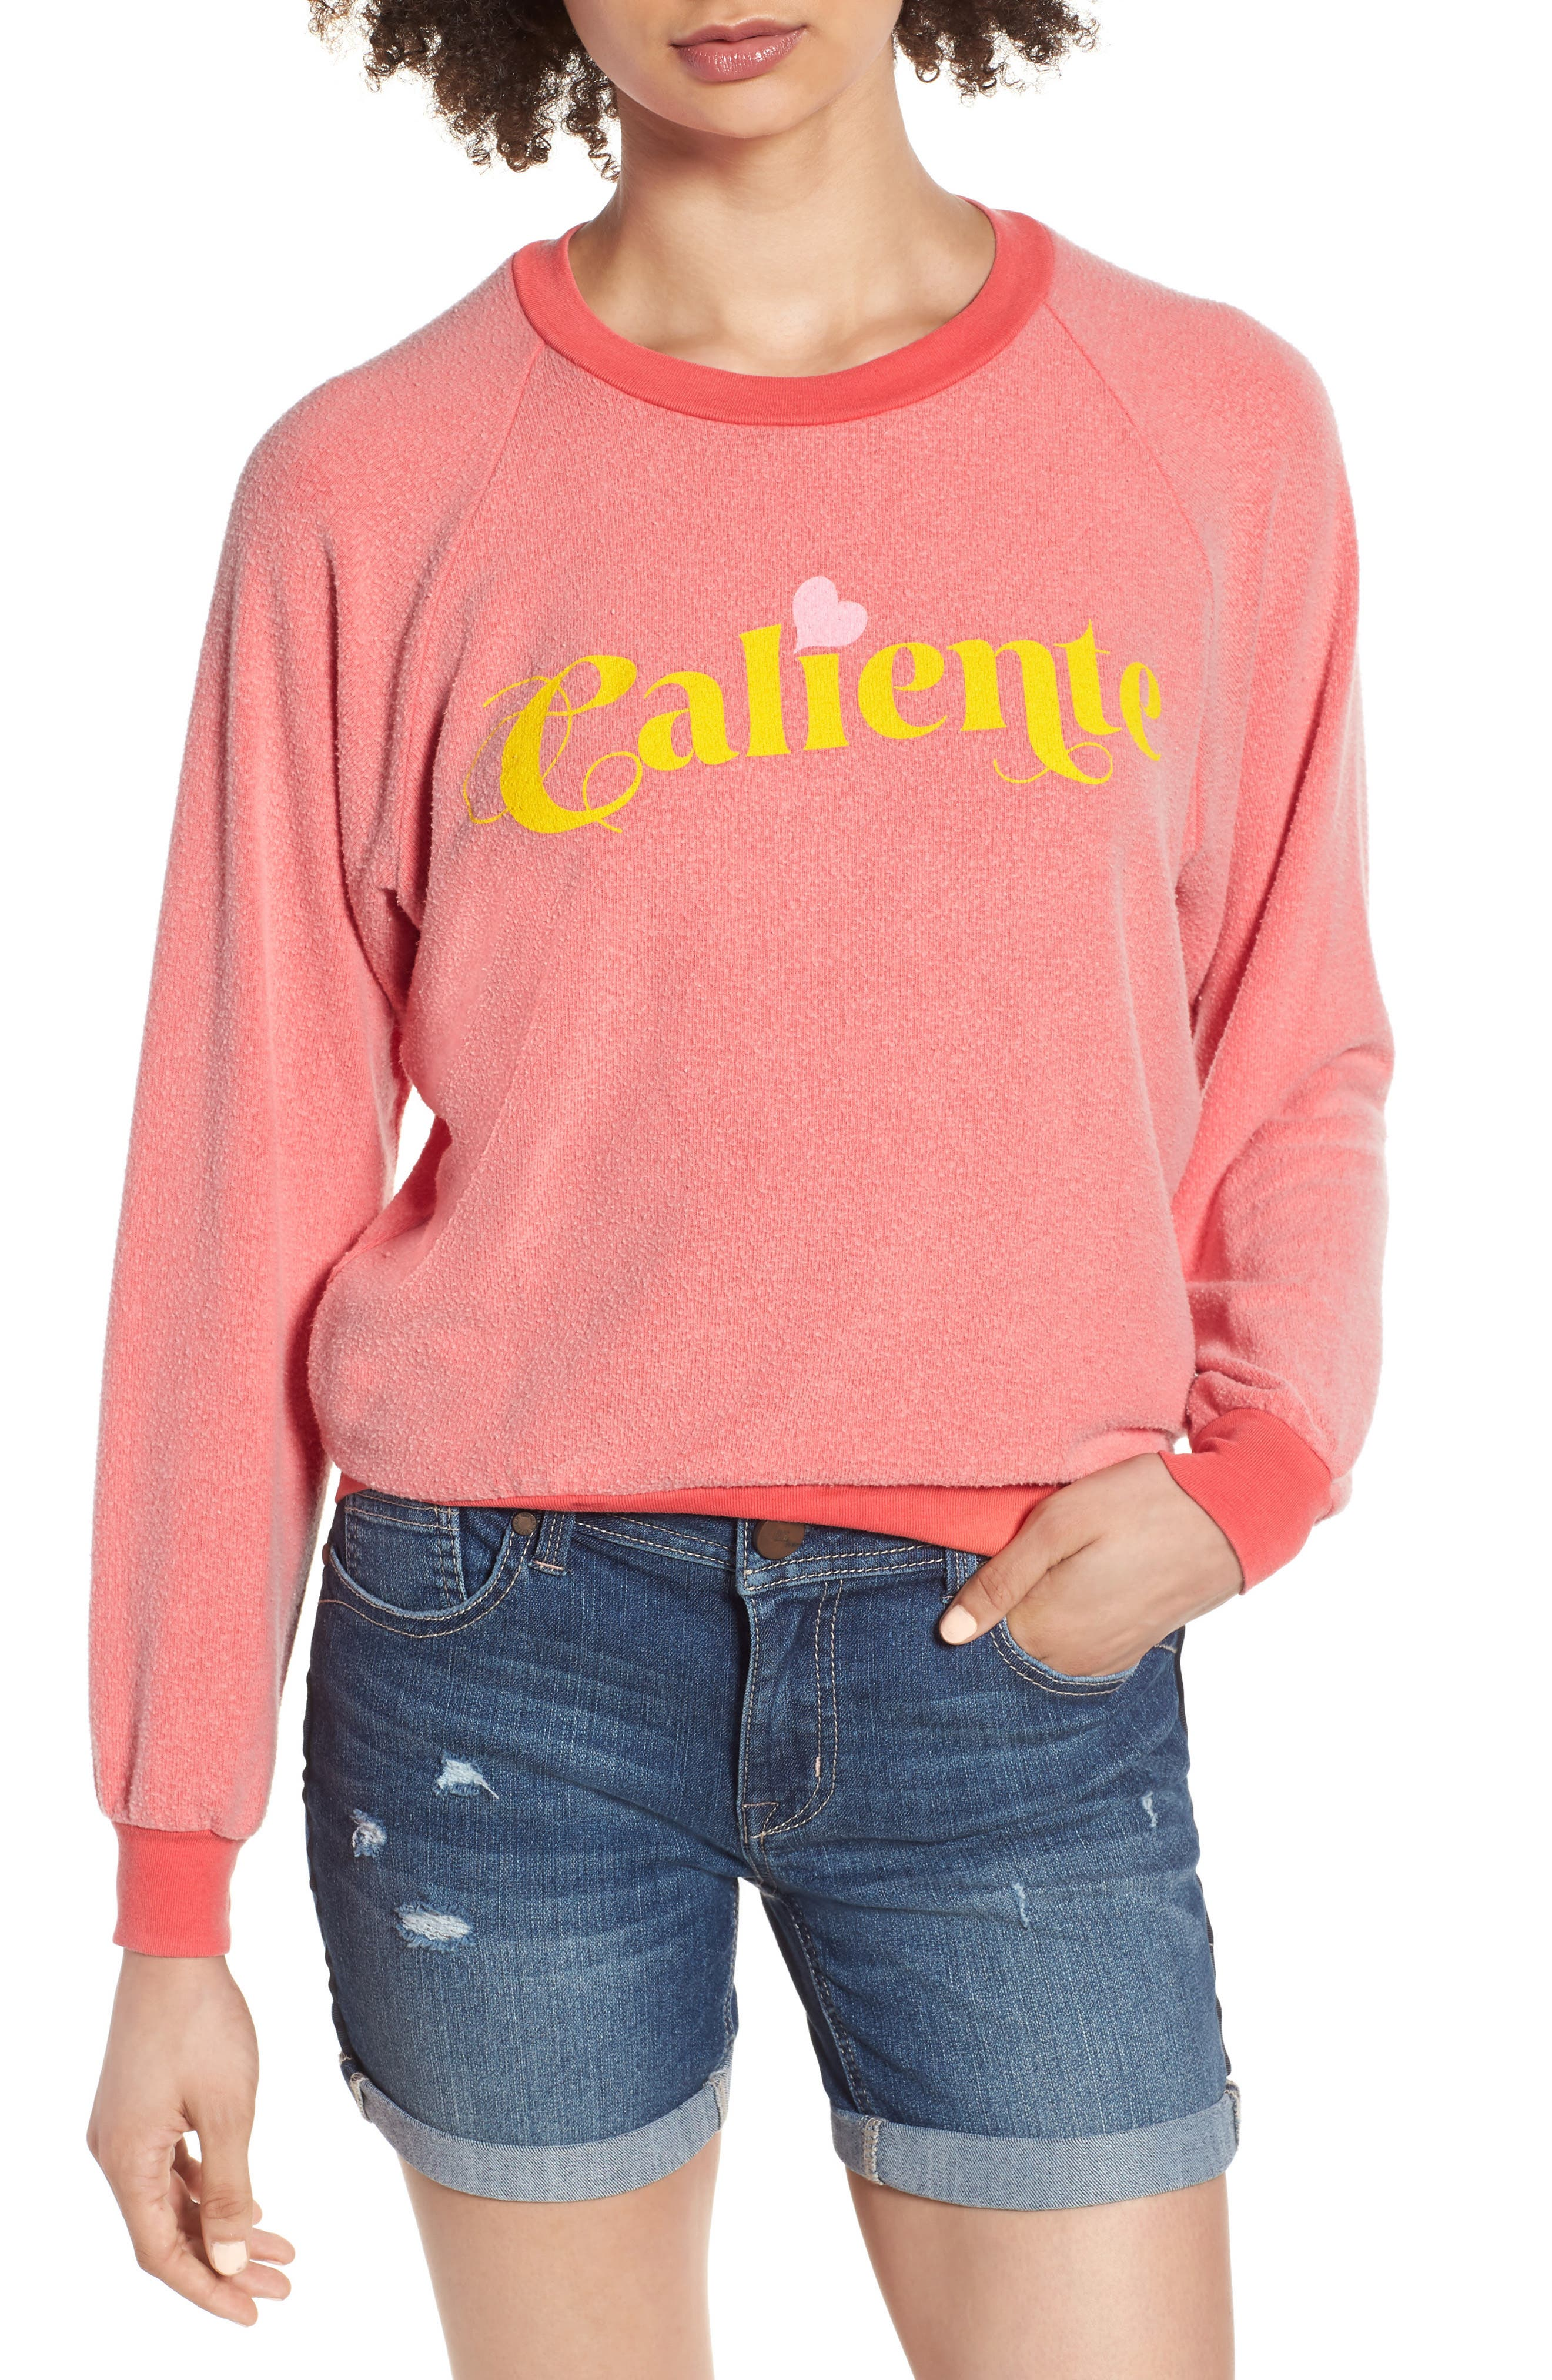 Caliente Junior Sweatshirt,                         Main,                         color, Pigment Hot Lipstick